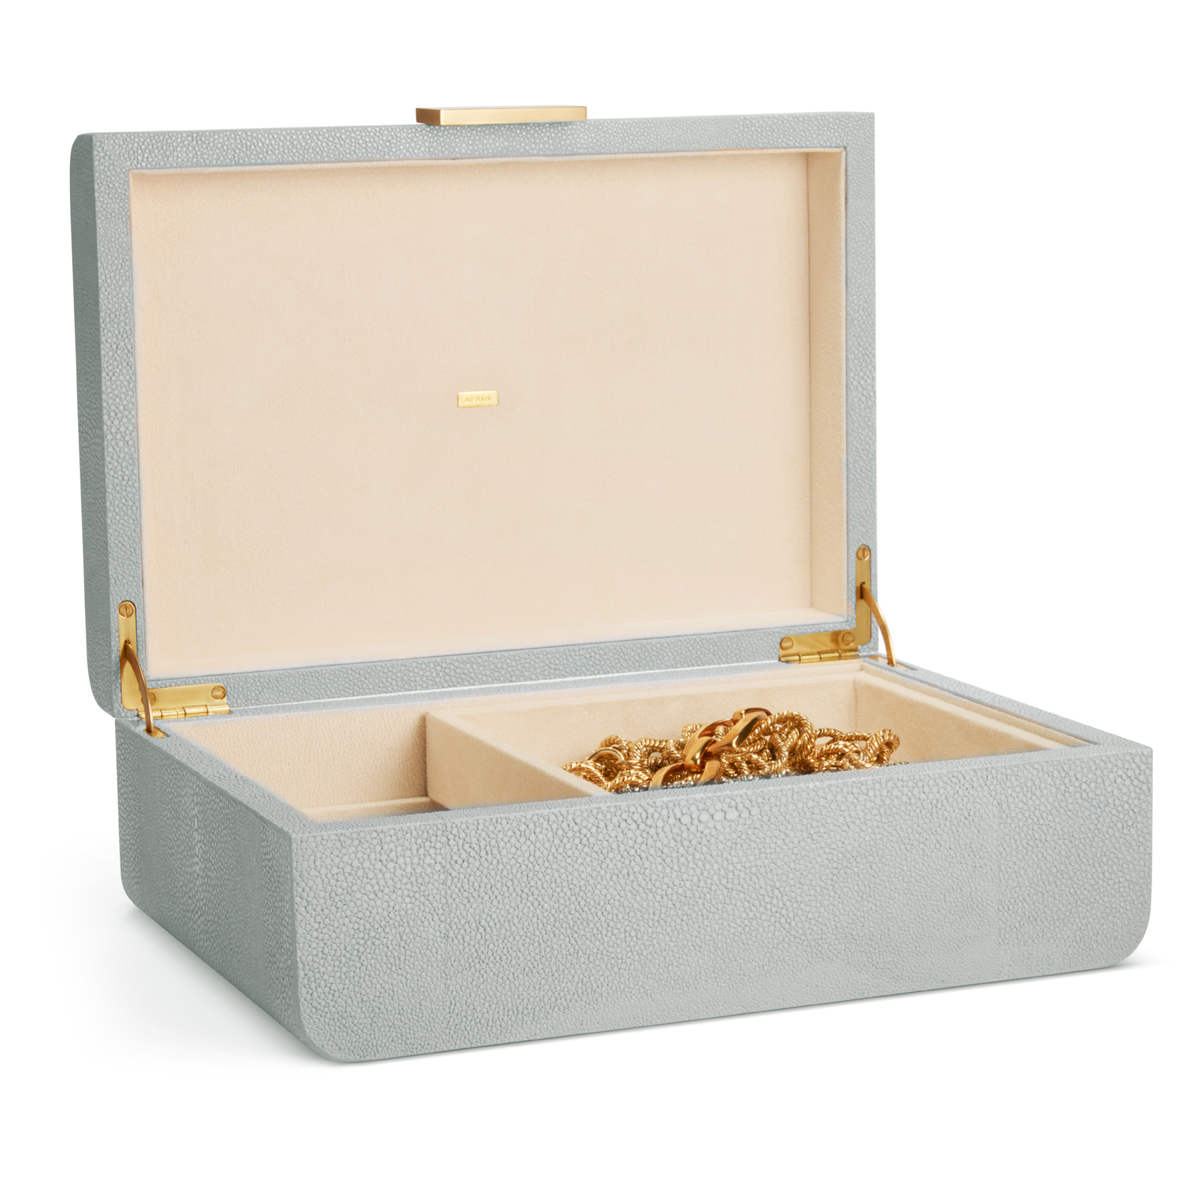 Aerin Modern Shagreen Large Jewelry Box, Mist